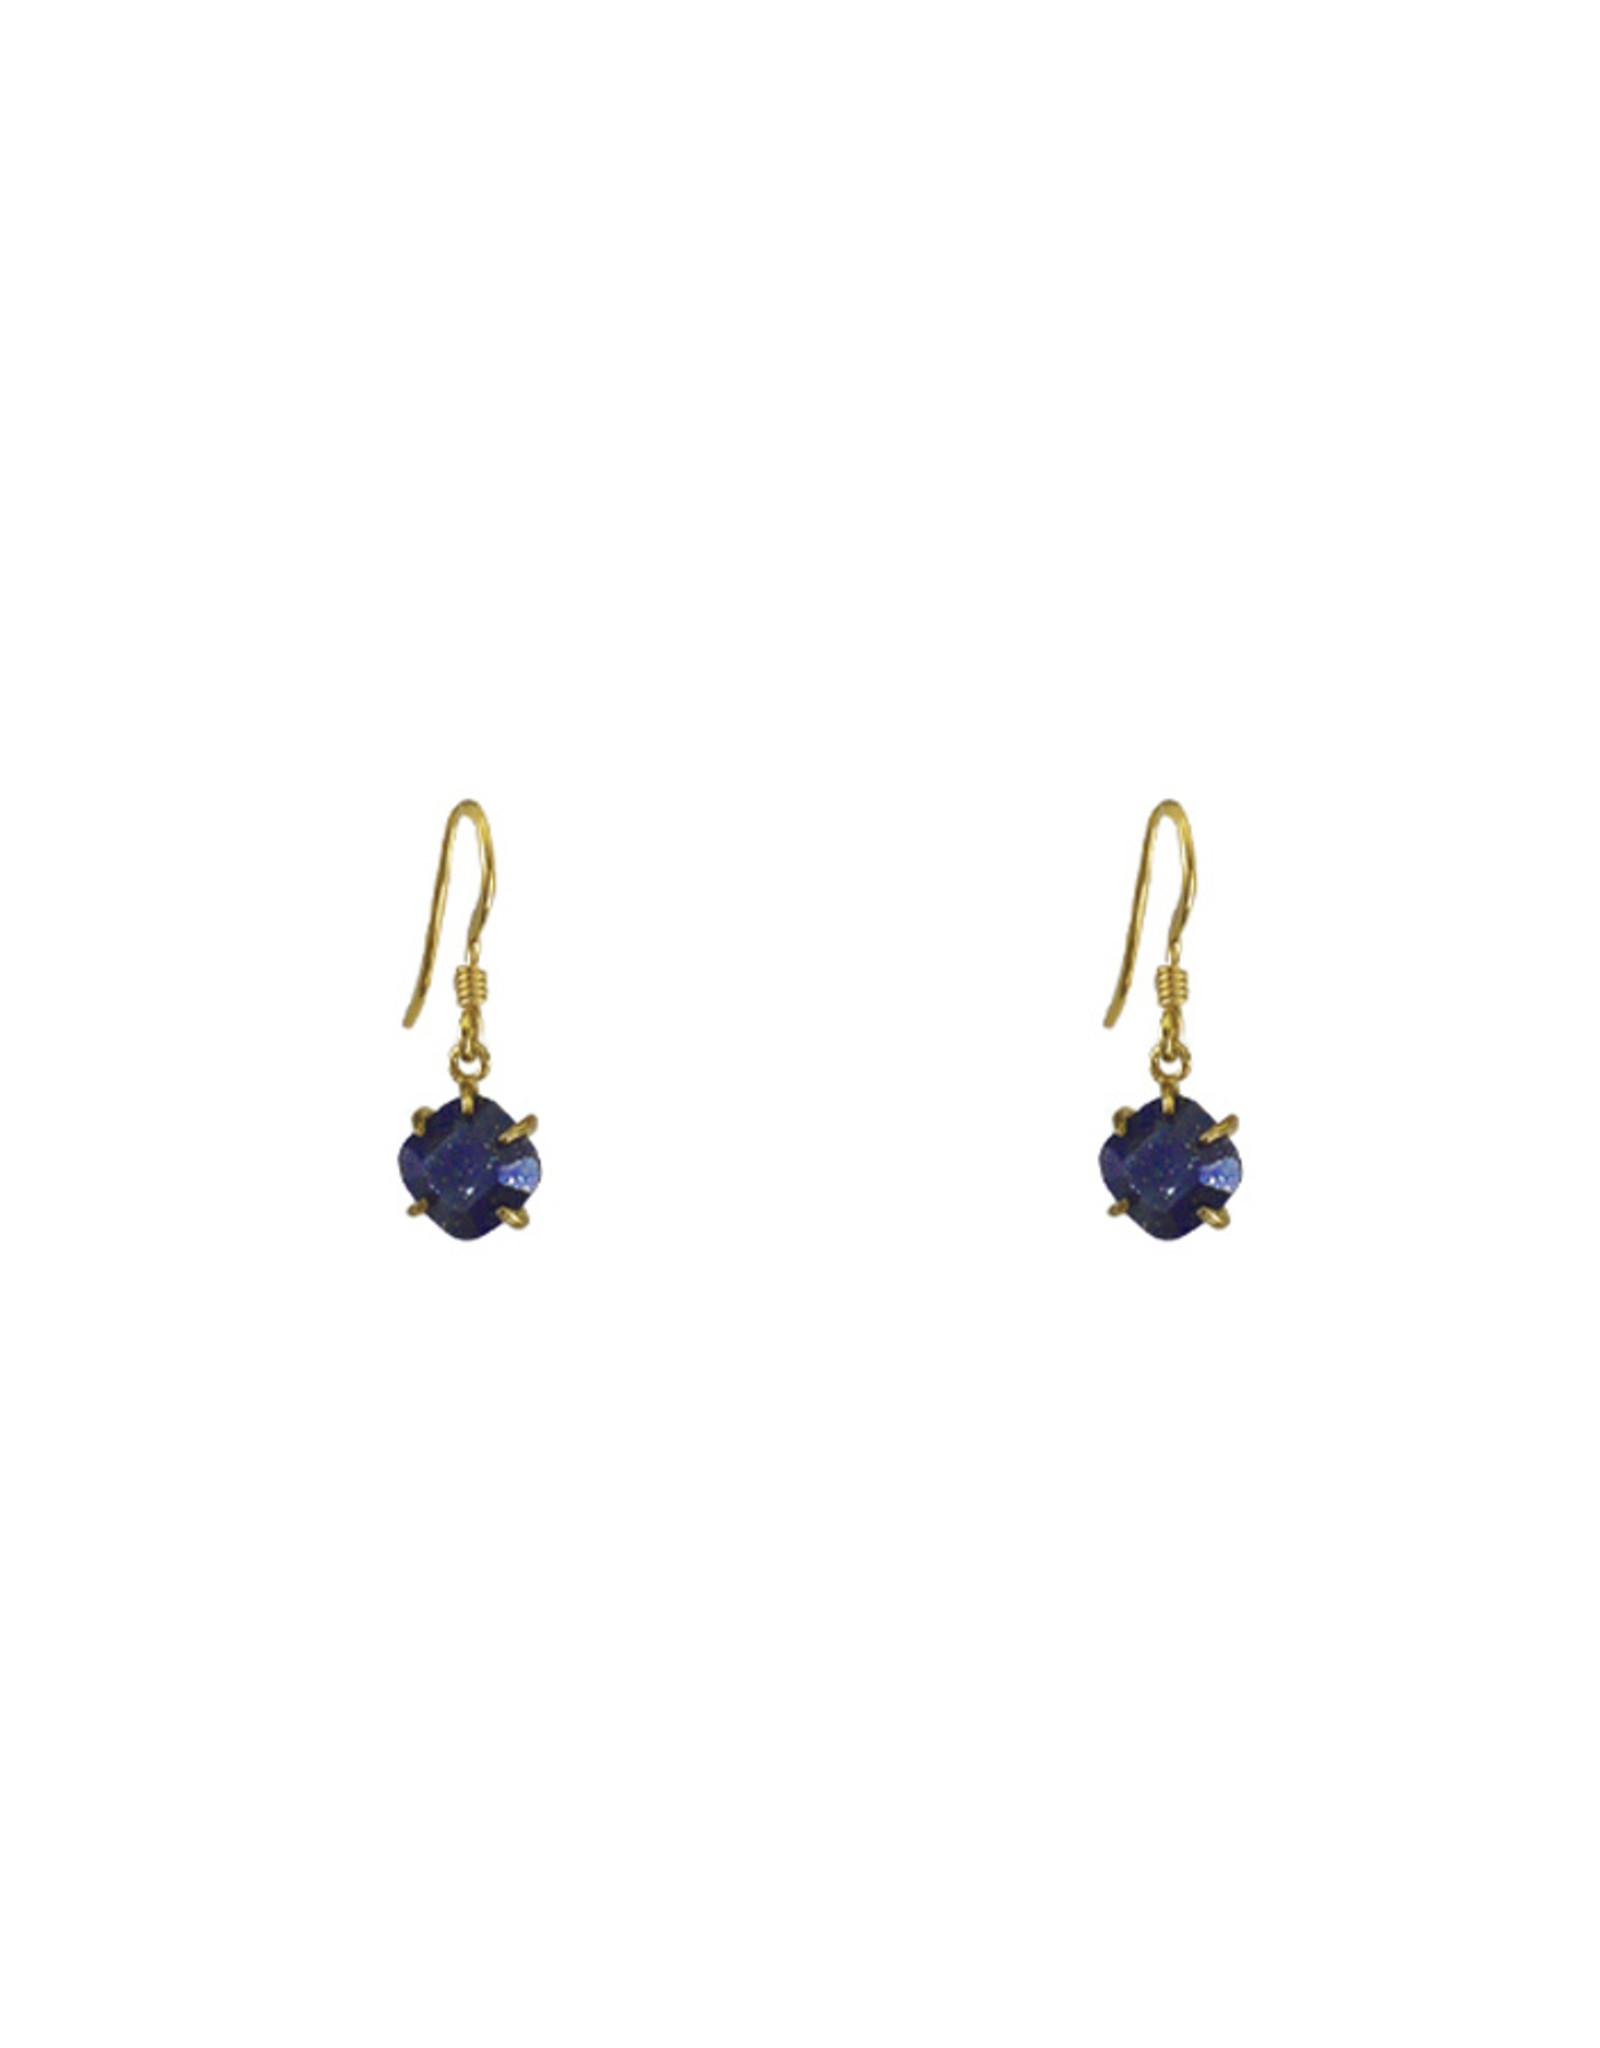 Lost & Faune BO Pierres semi-précieuses AH2021 Lost & Faune Or Lapis Lazuli